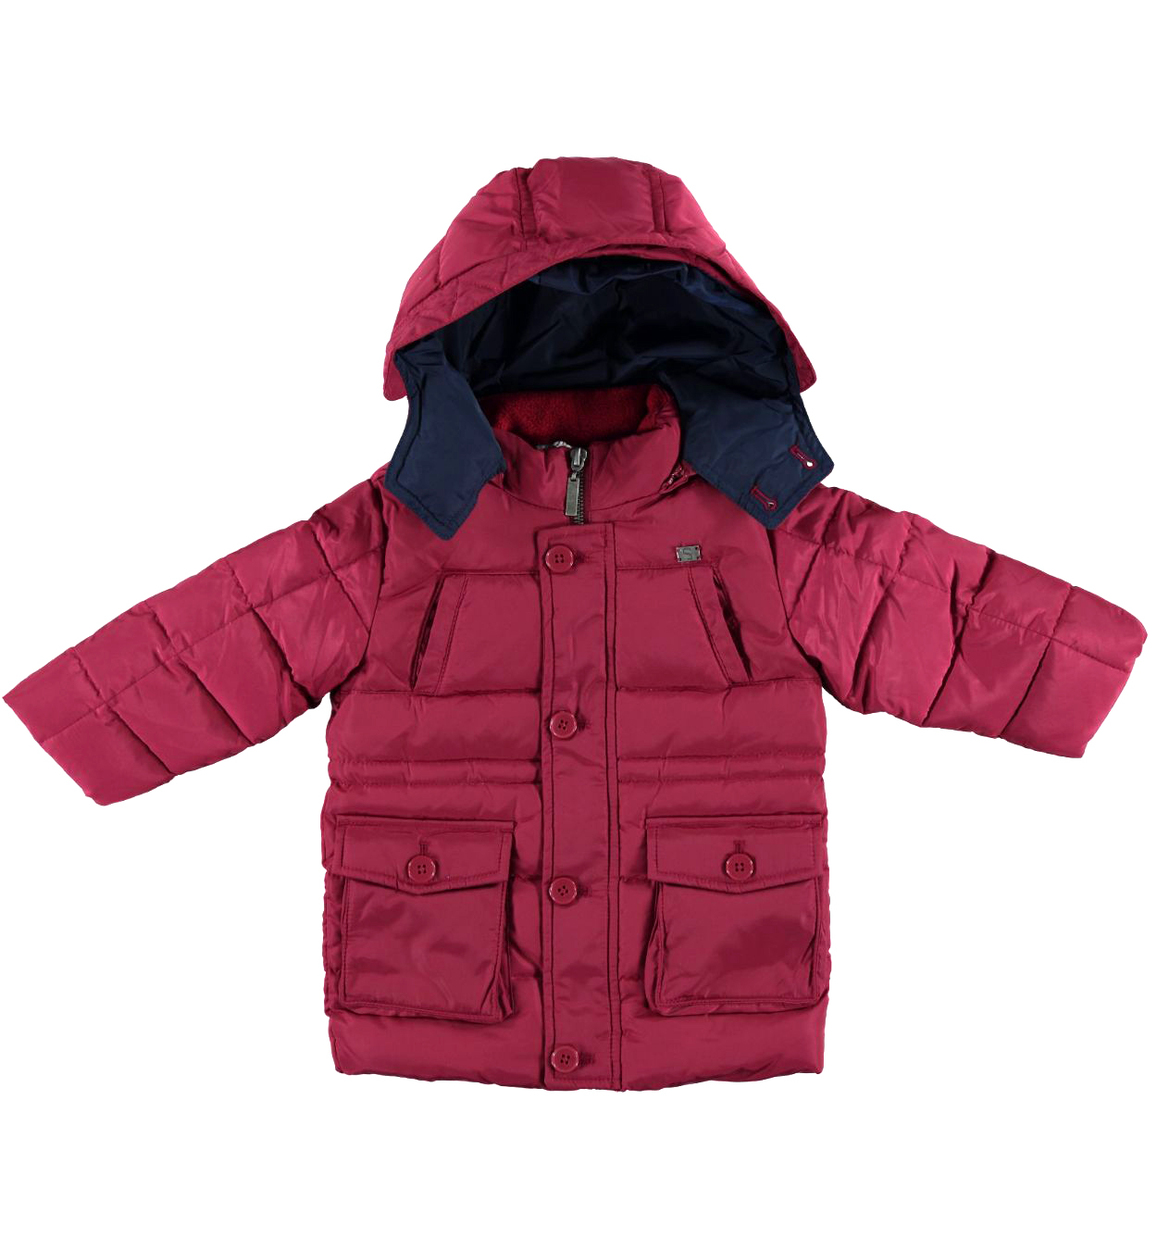 wholesale dealer 87c9b 2e658 Giubbotto invernale foderato in caldo pile per bambino da 6 mesi a 7 anni  Sarabanda